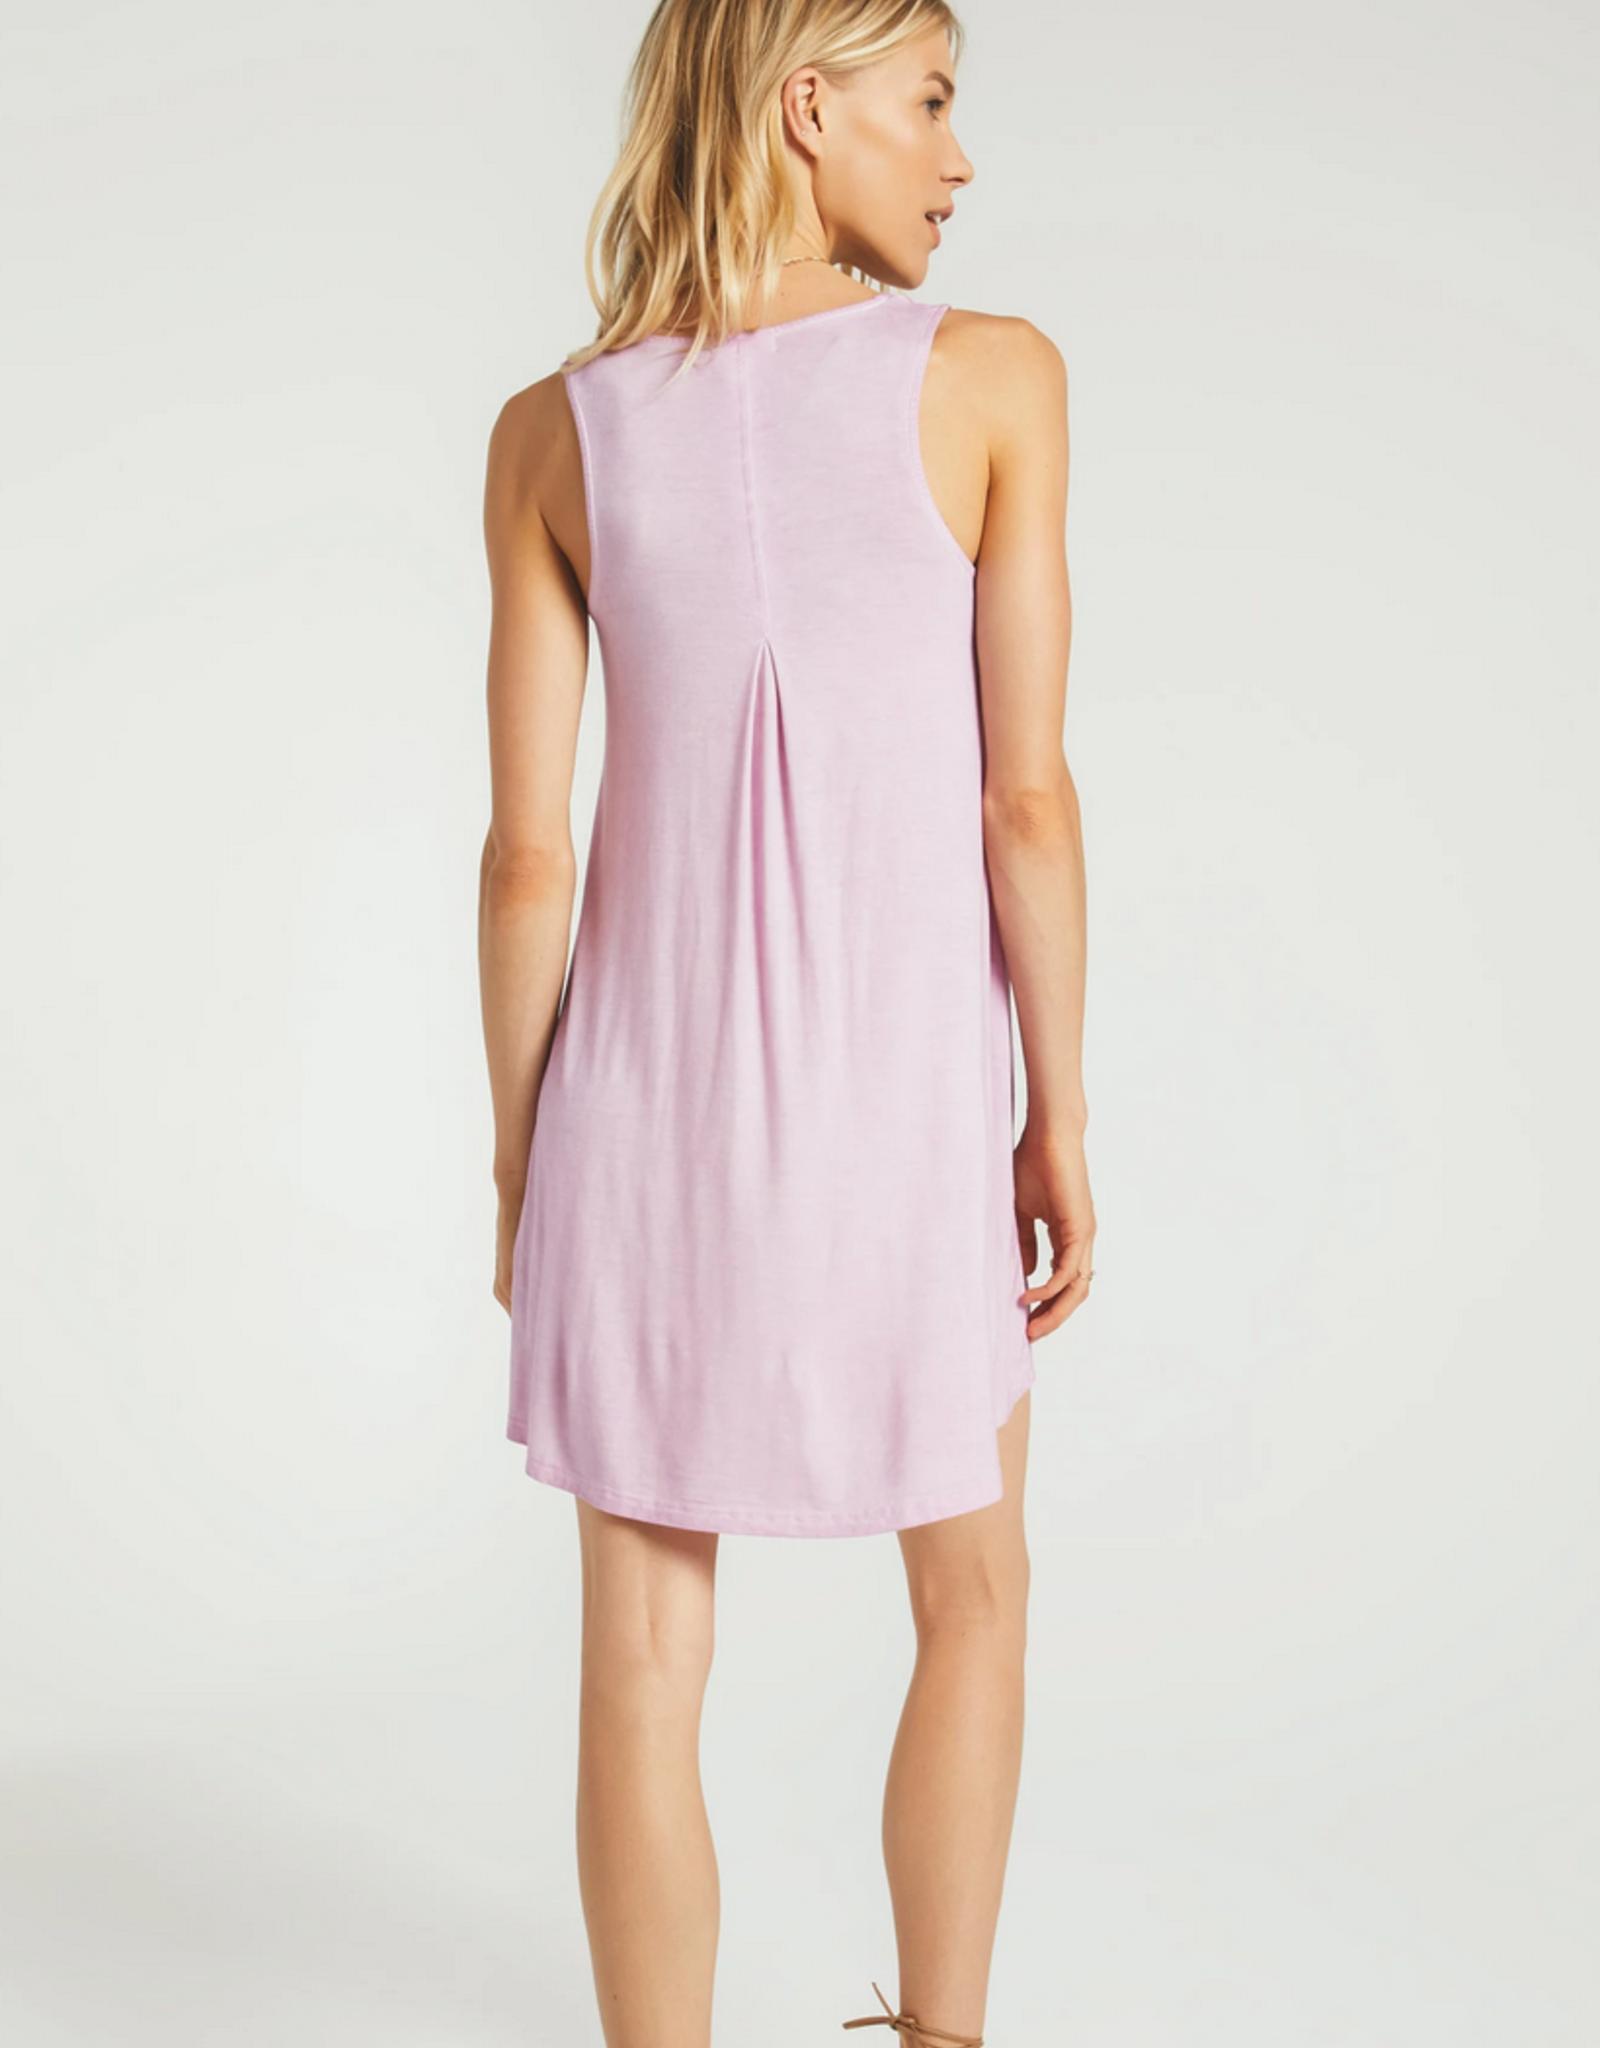 Z Supply Bay V-Neck Dress